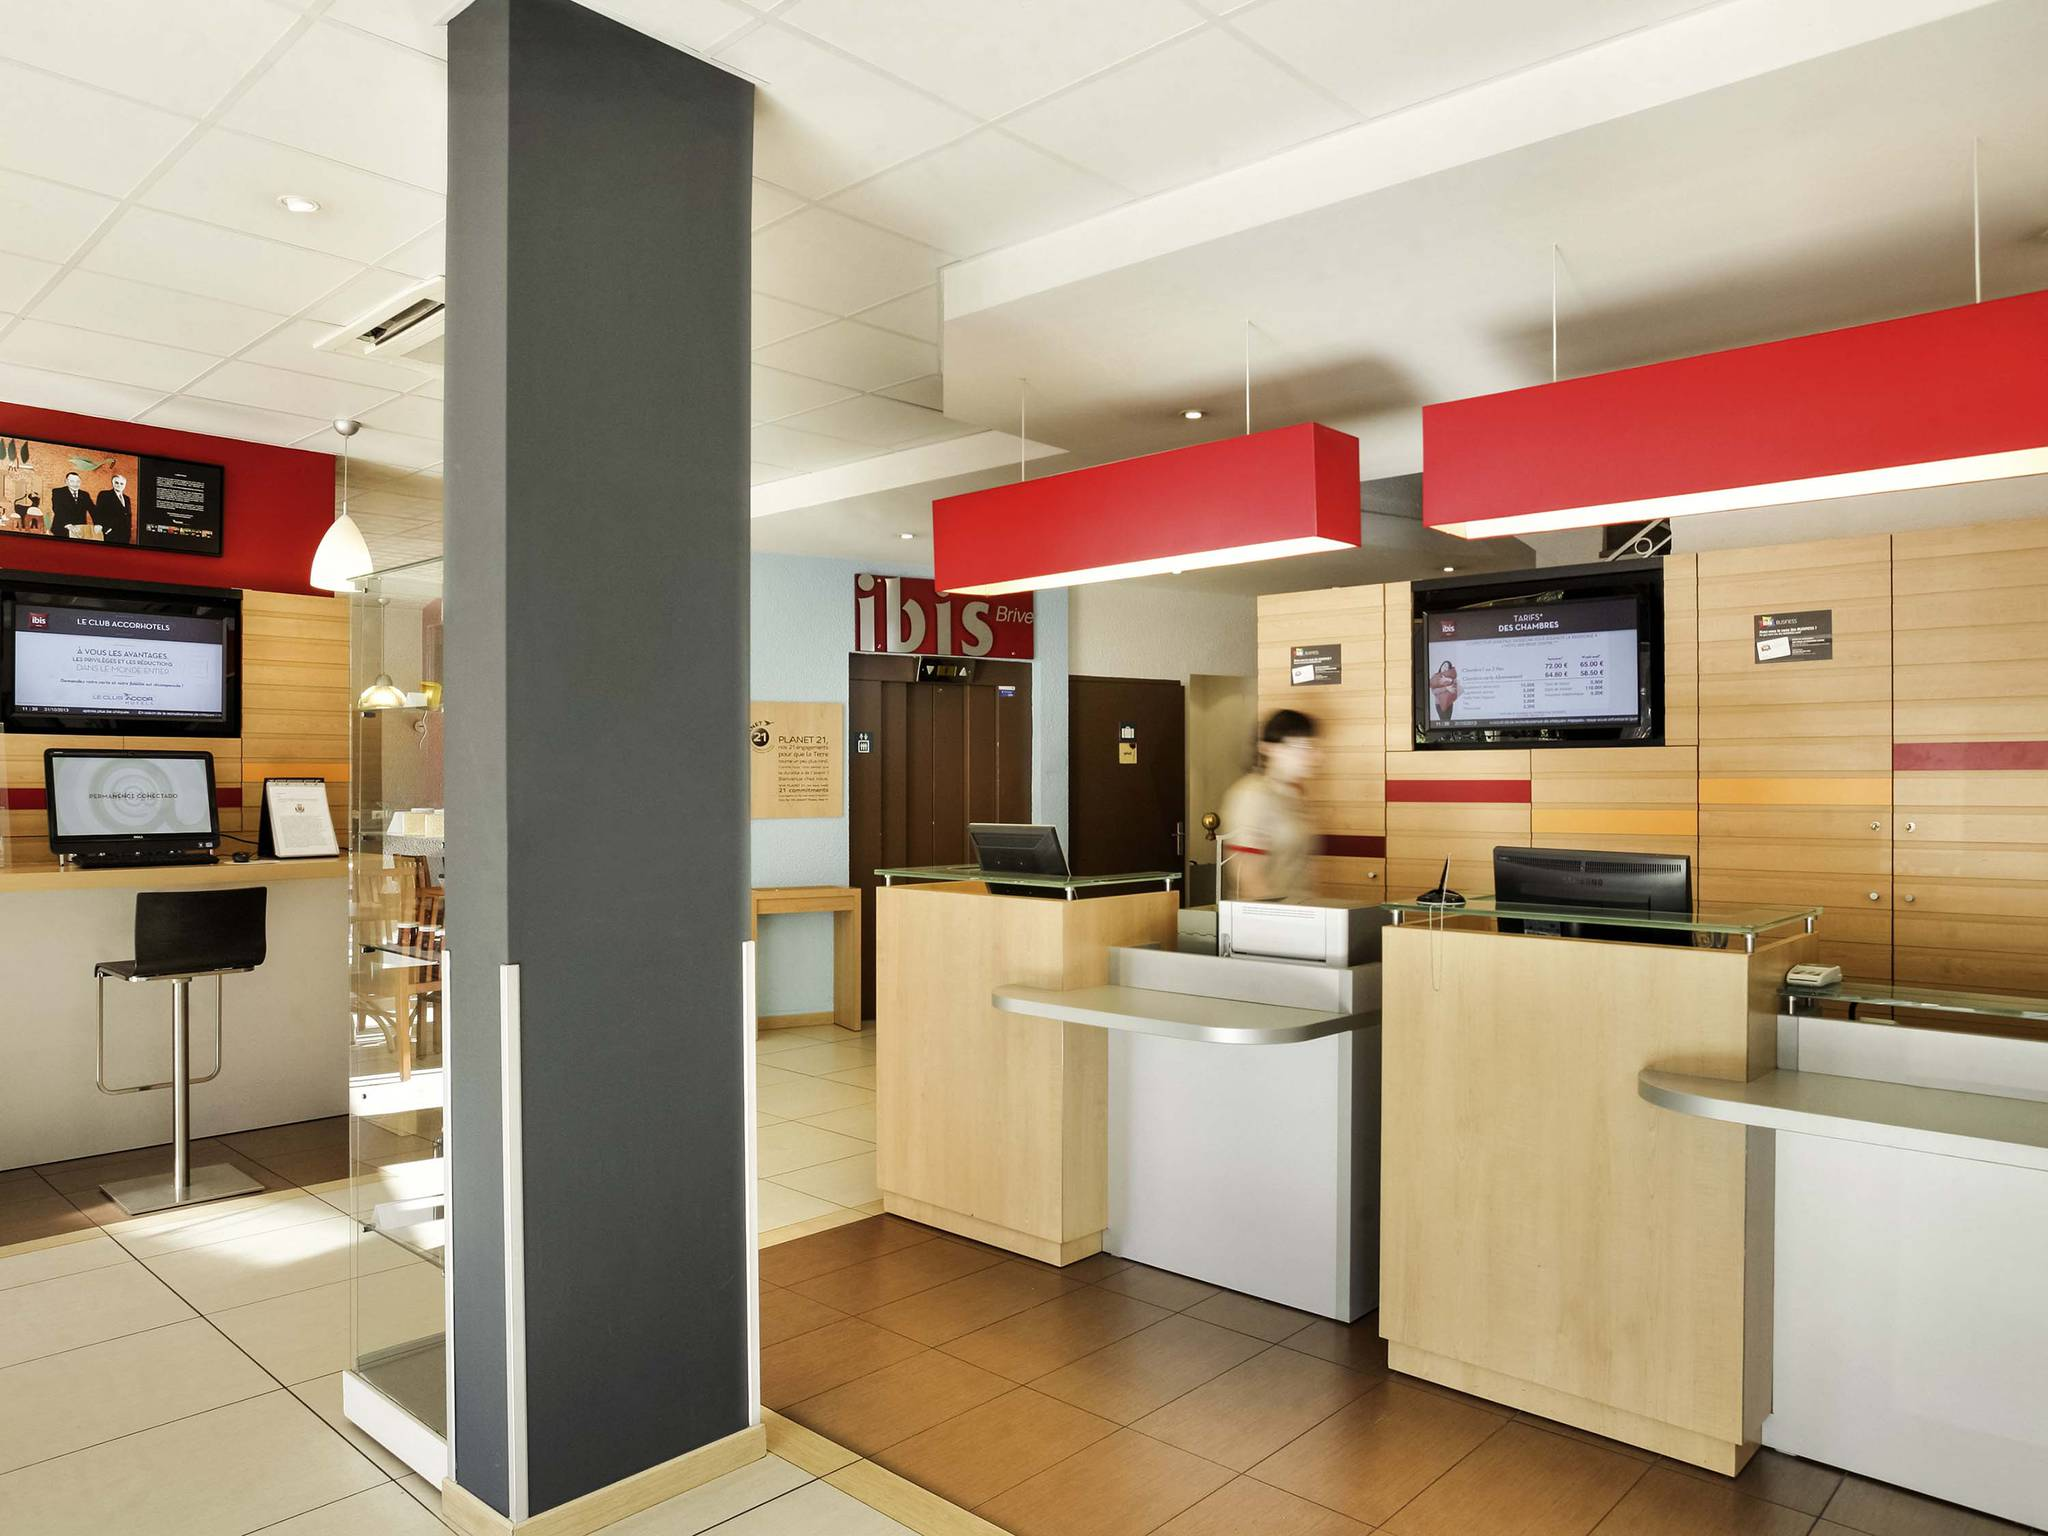 Hotel - ibis Brive centre